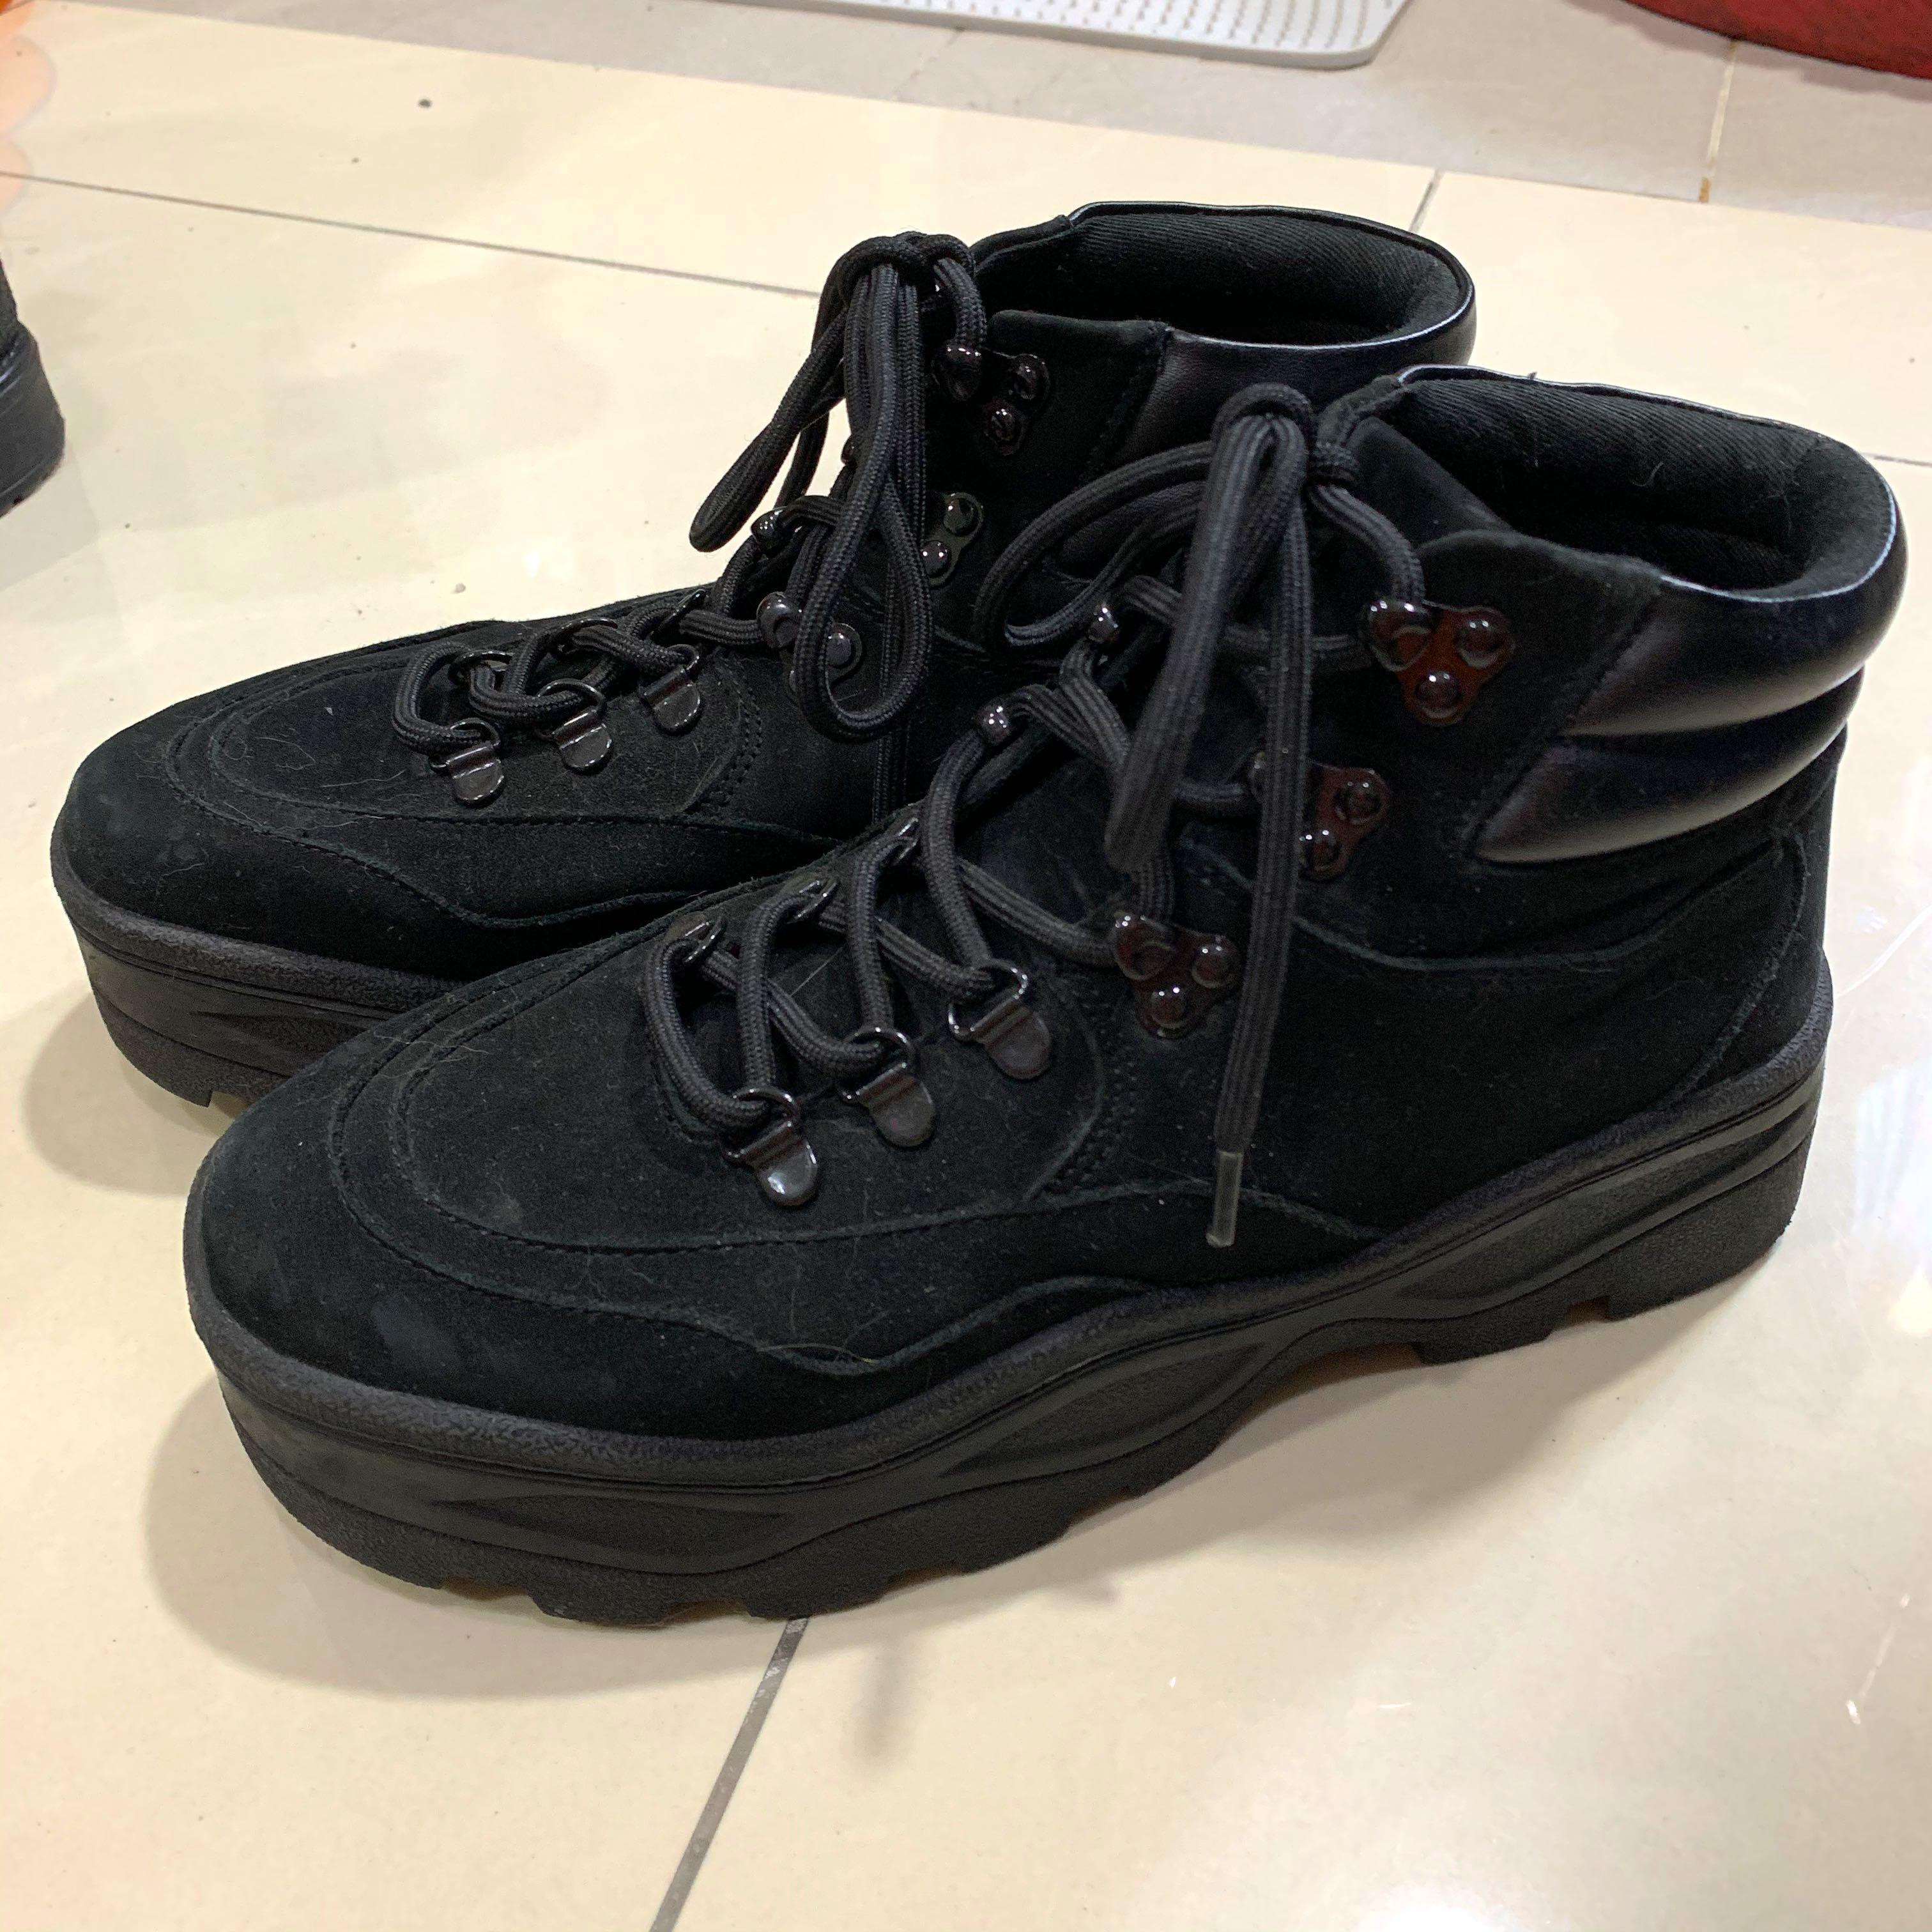 Steve Madden 黑短厚底軍靴 老爹鞋 sly vii&co